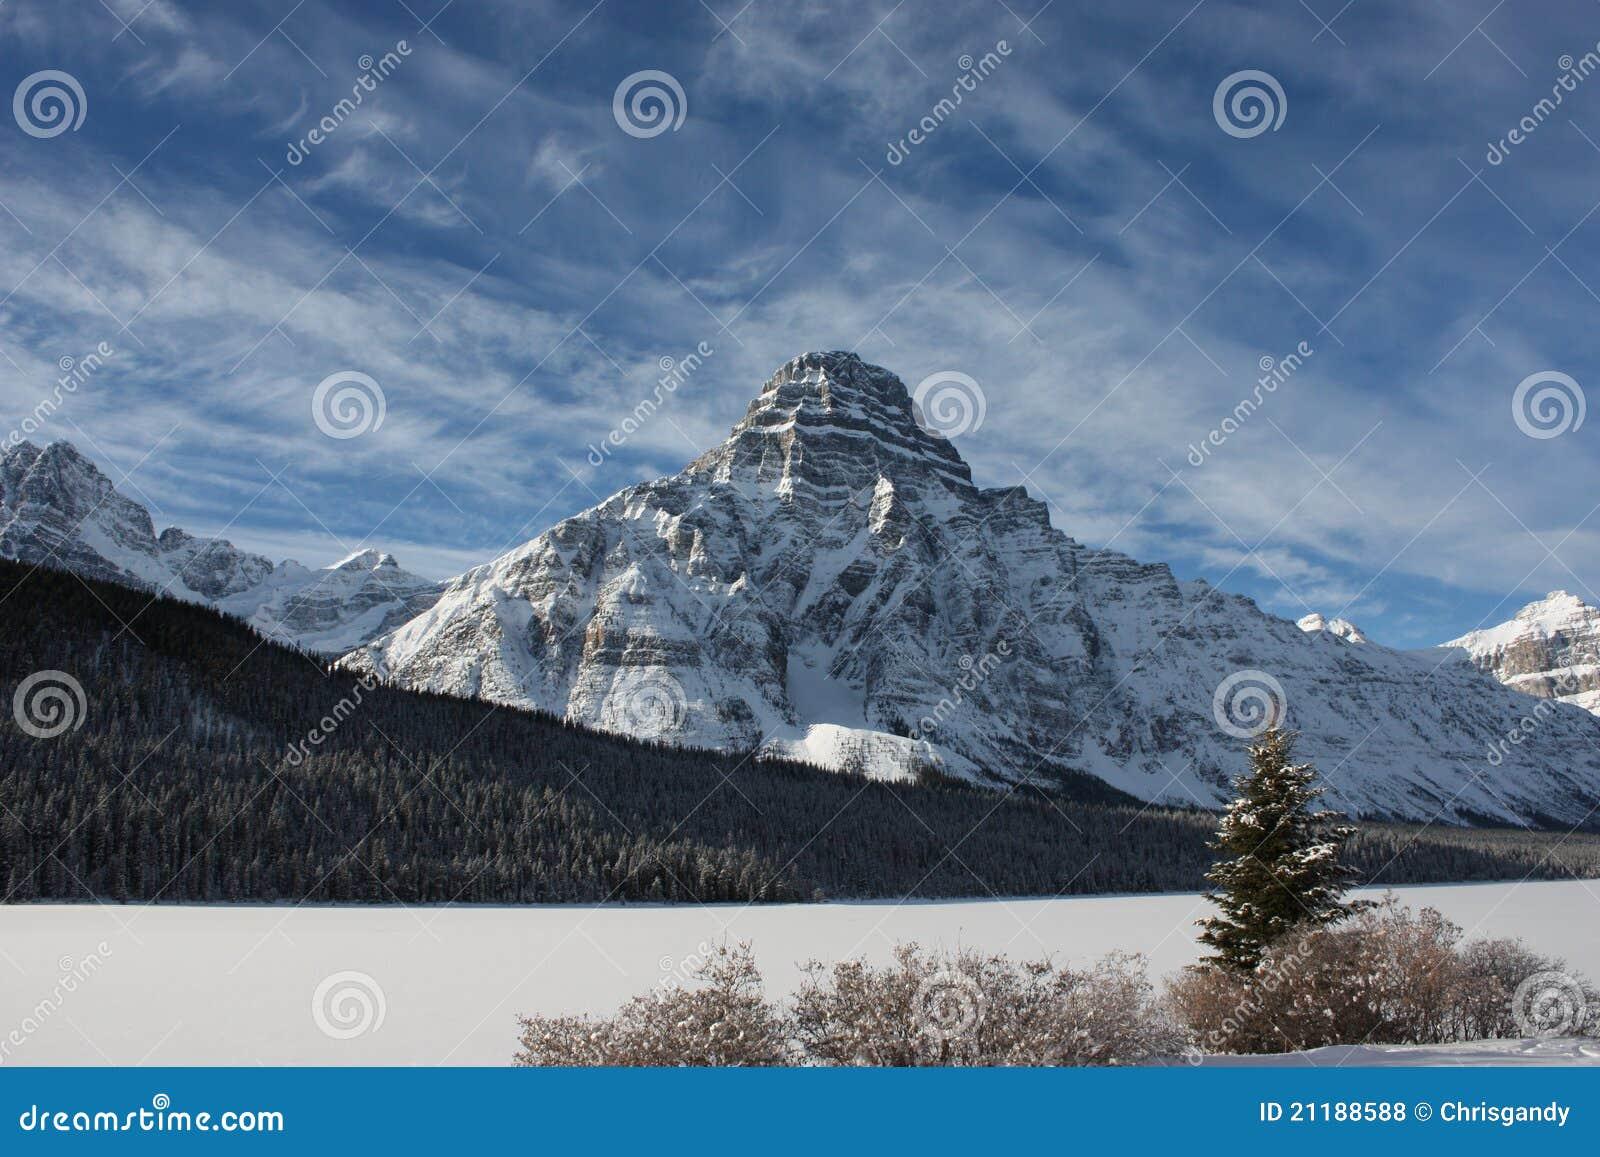 Mountain under a blue sky